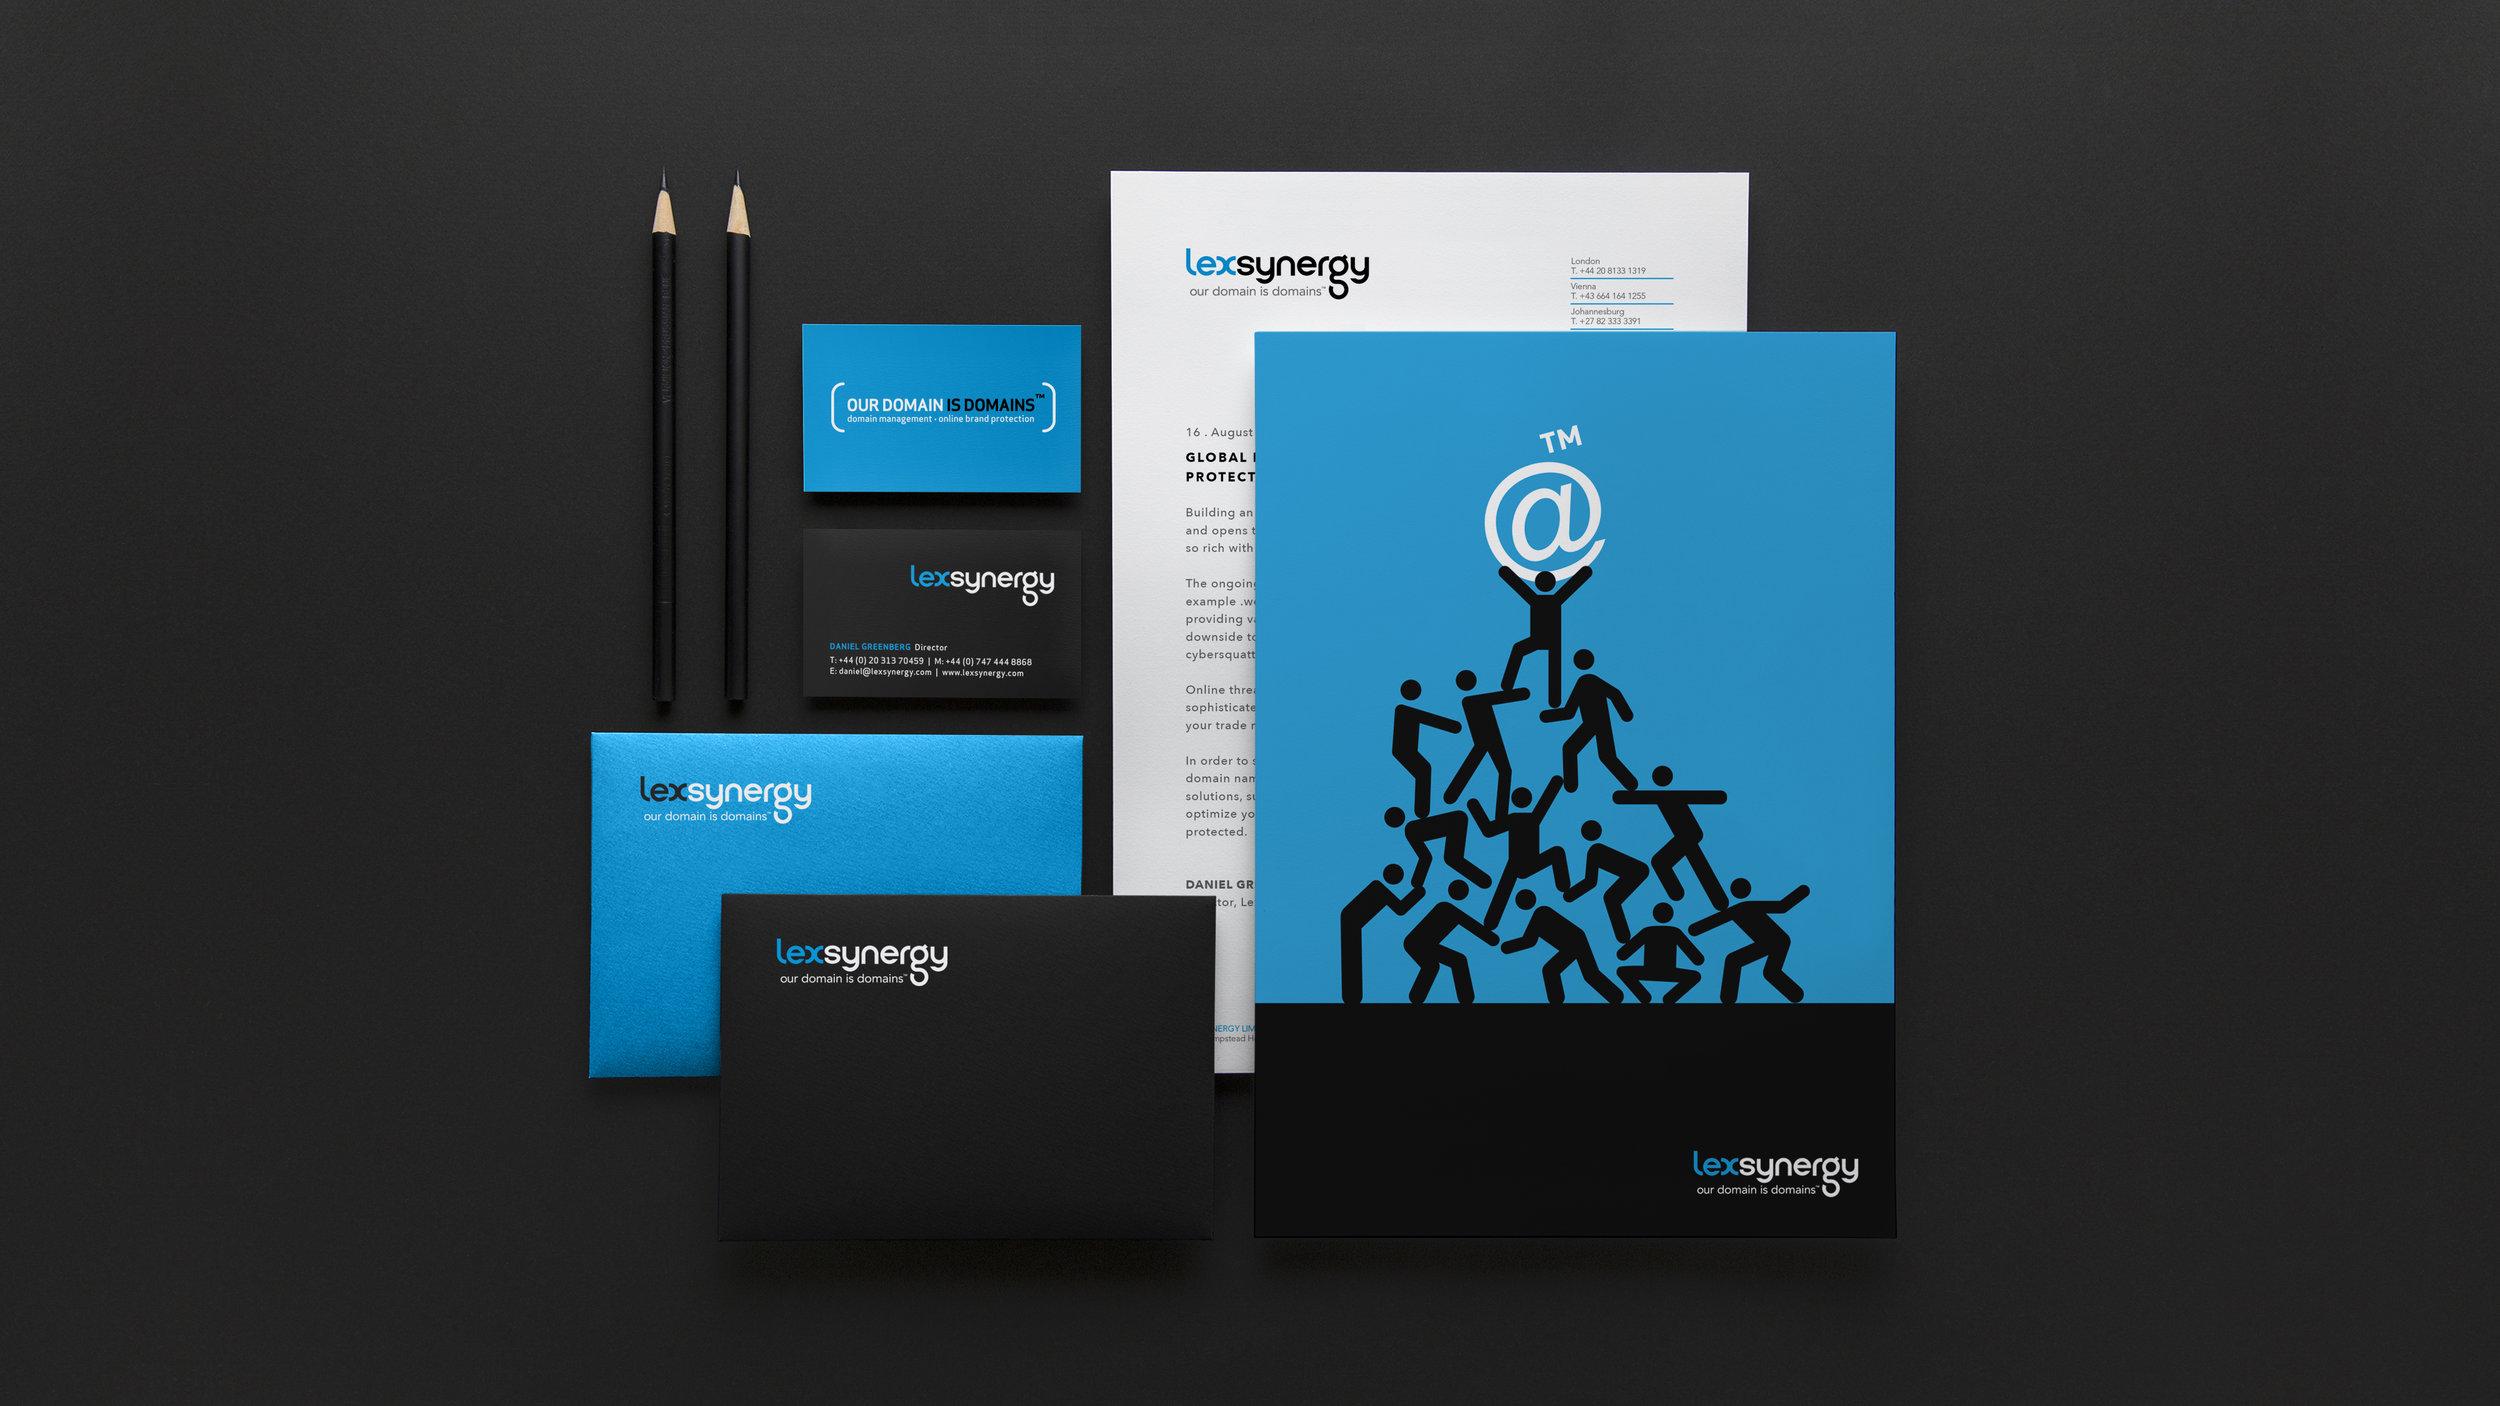 Brand_republica_stationery_design_lexsynergy.jpg